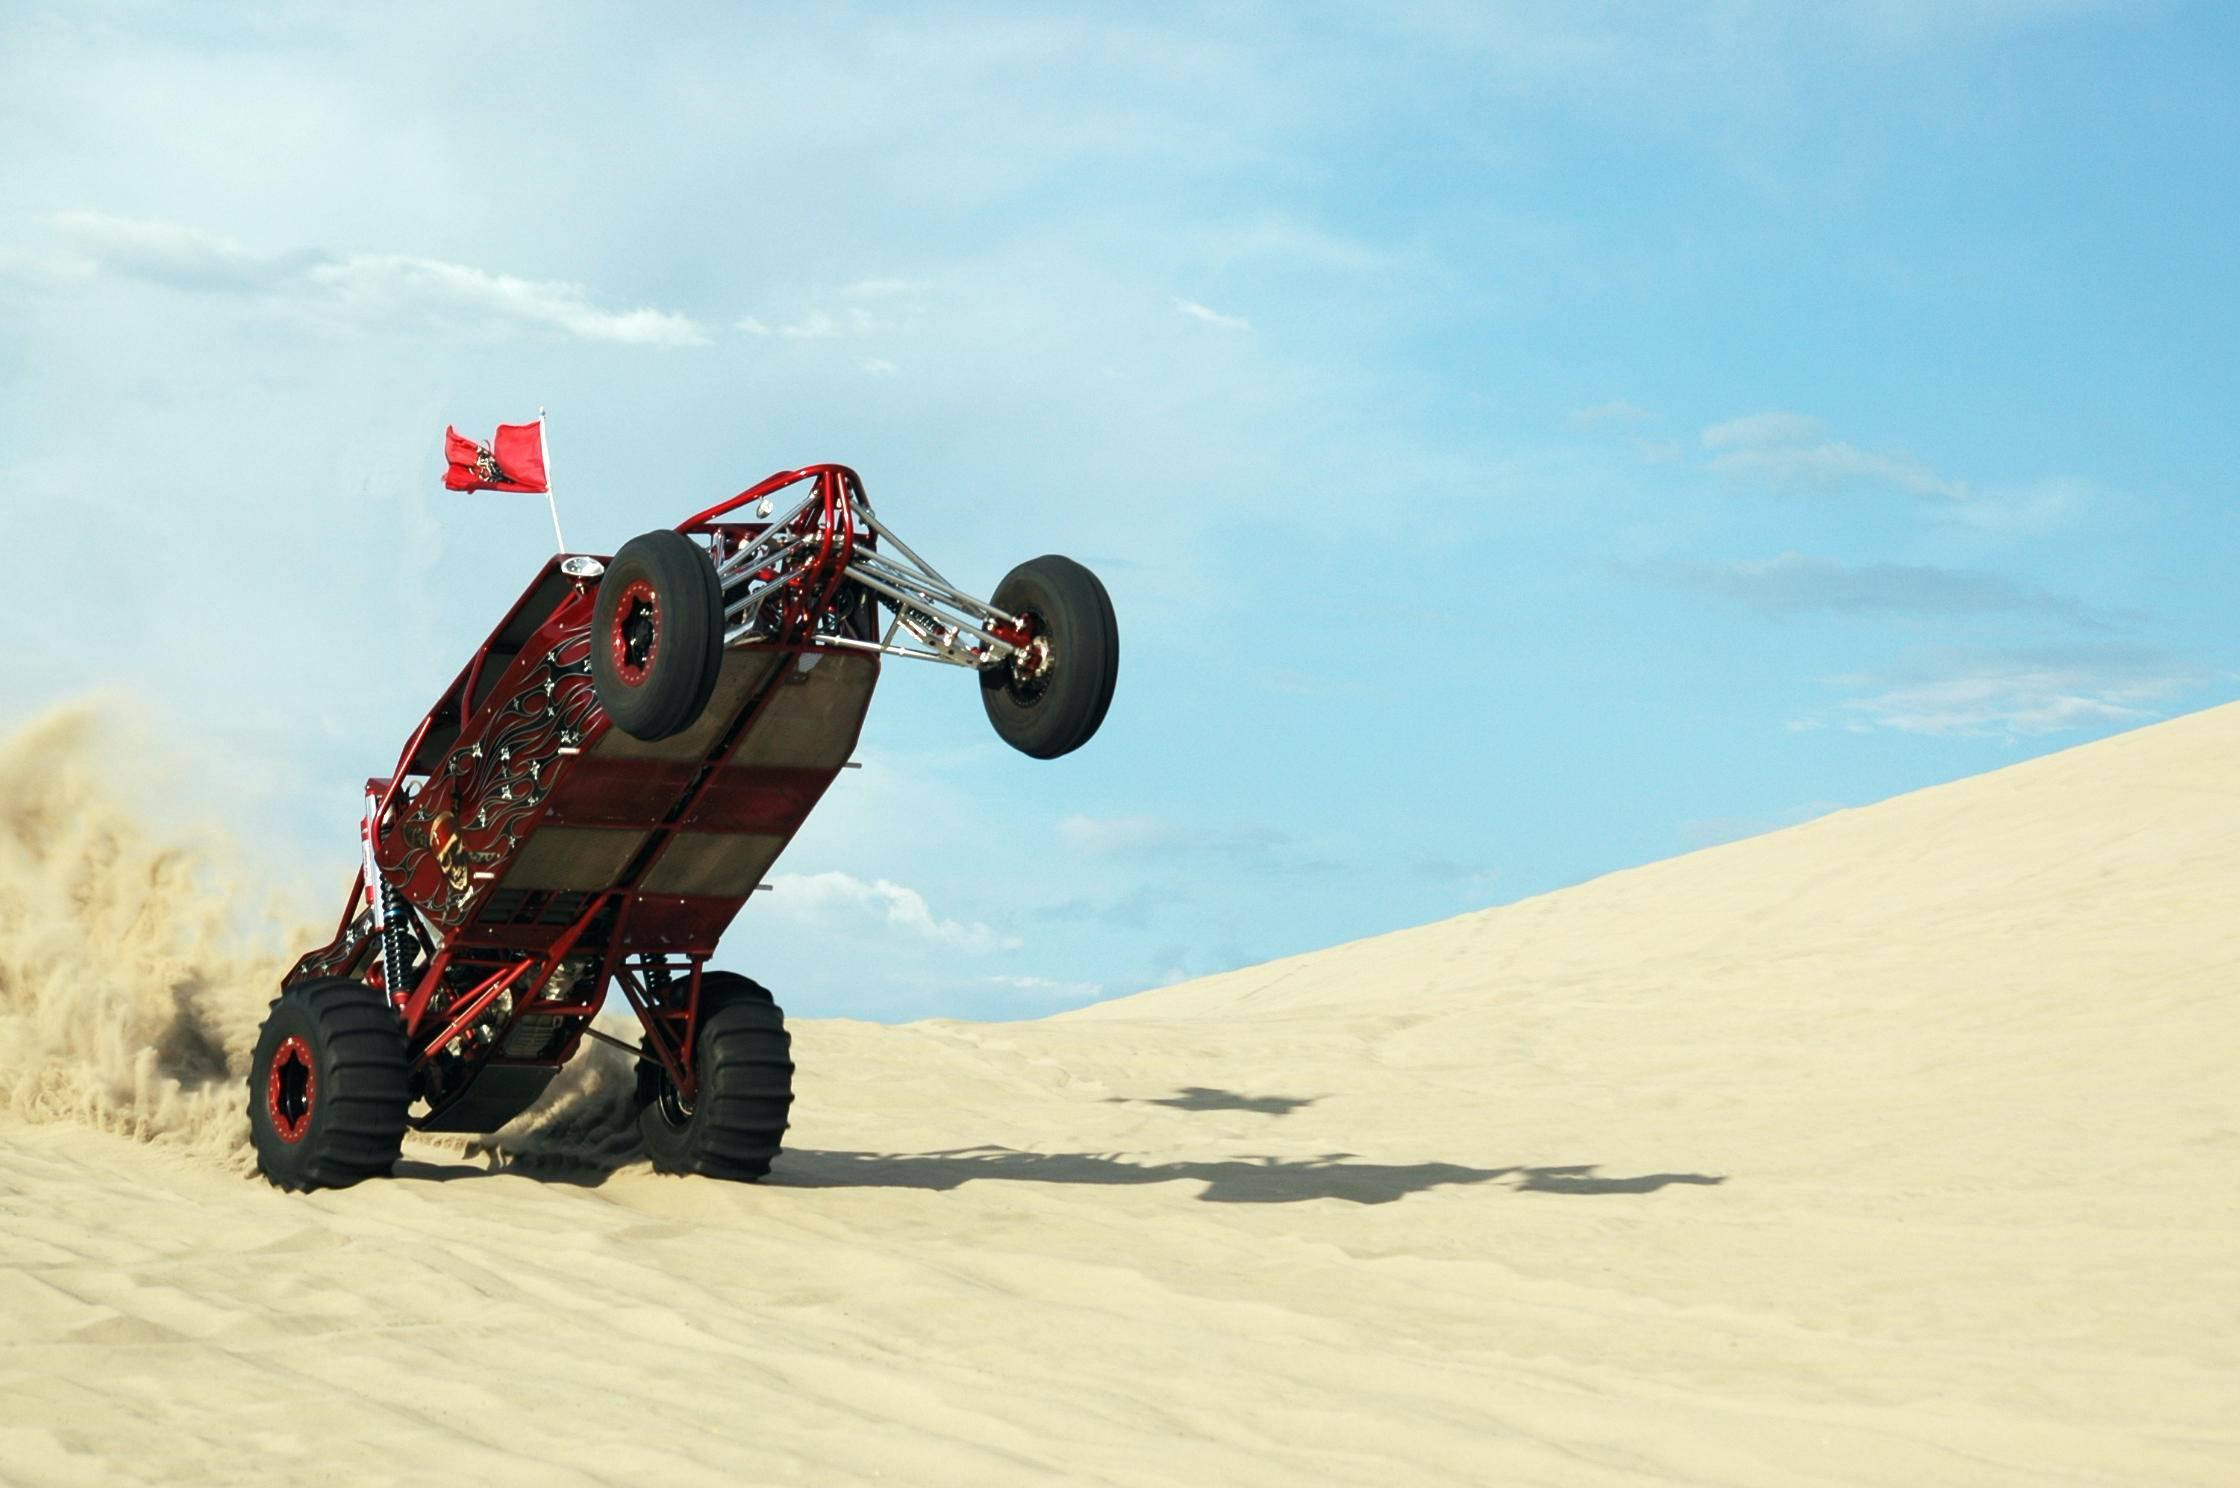 China 4500cc Wheelie Sand Rail - China Dund Buggy, Sand Buggy